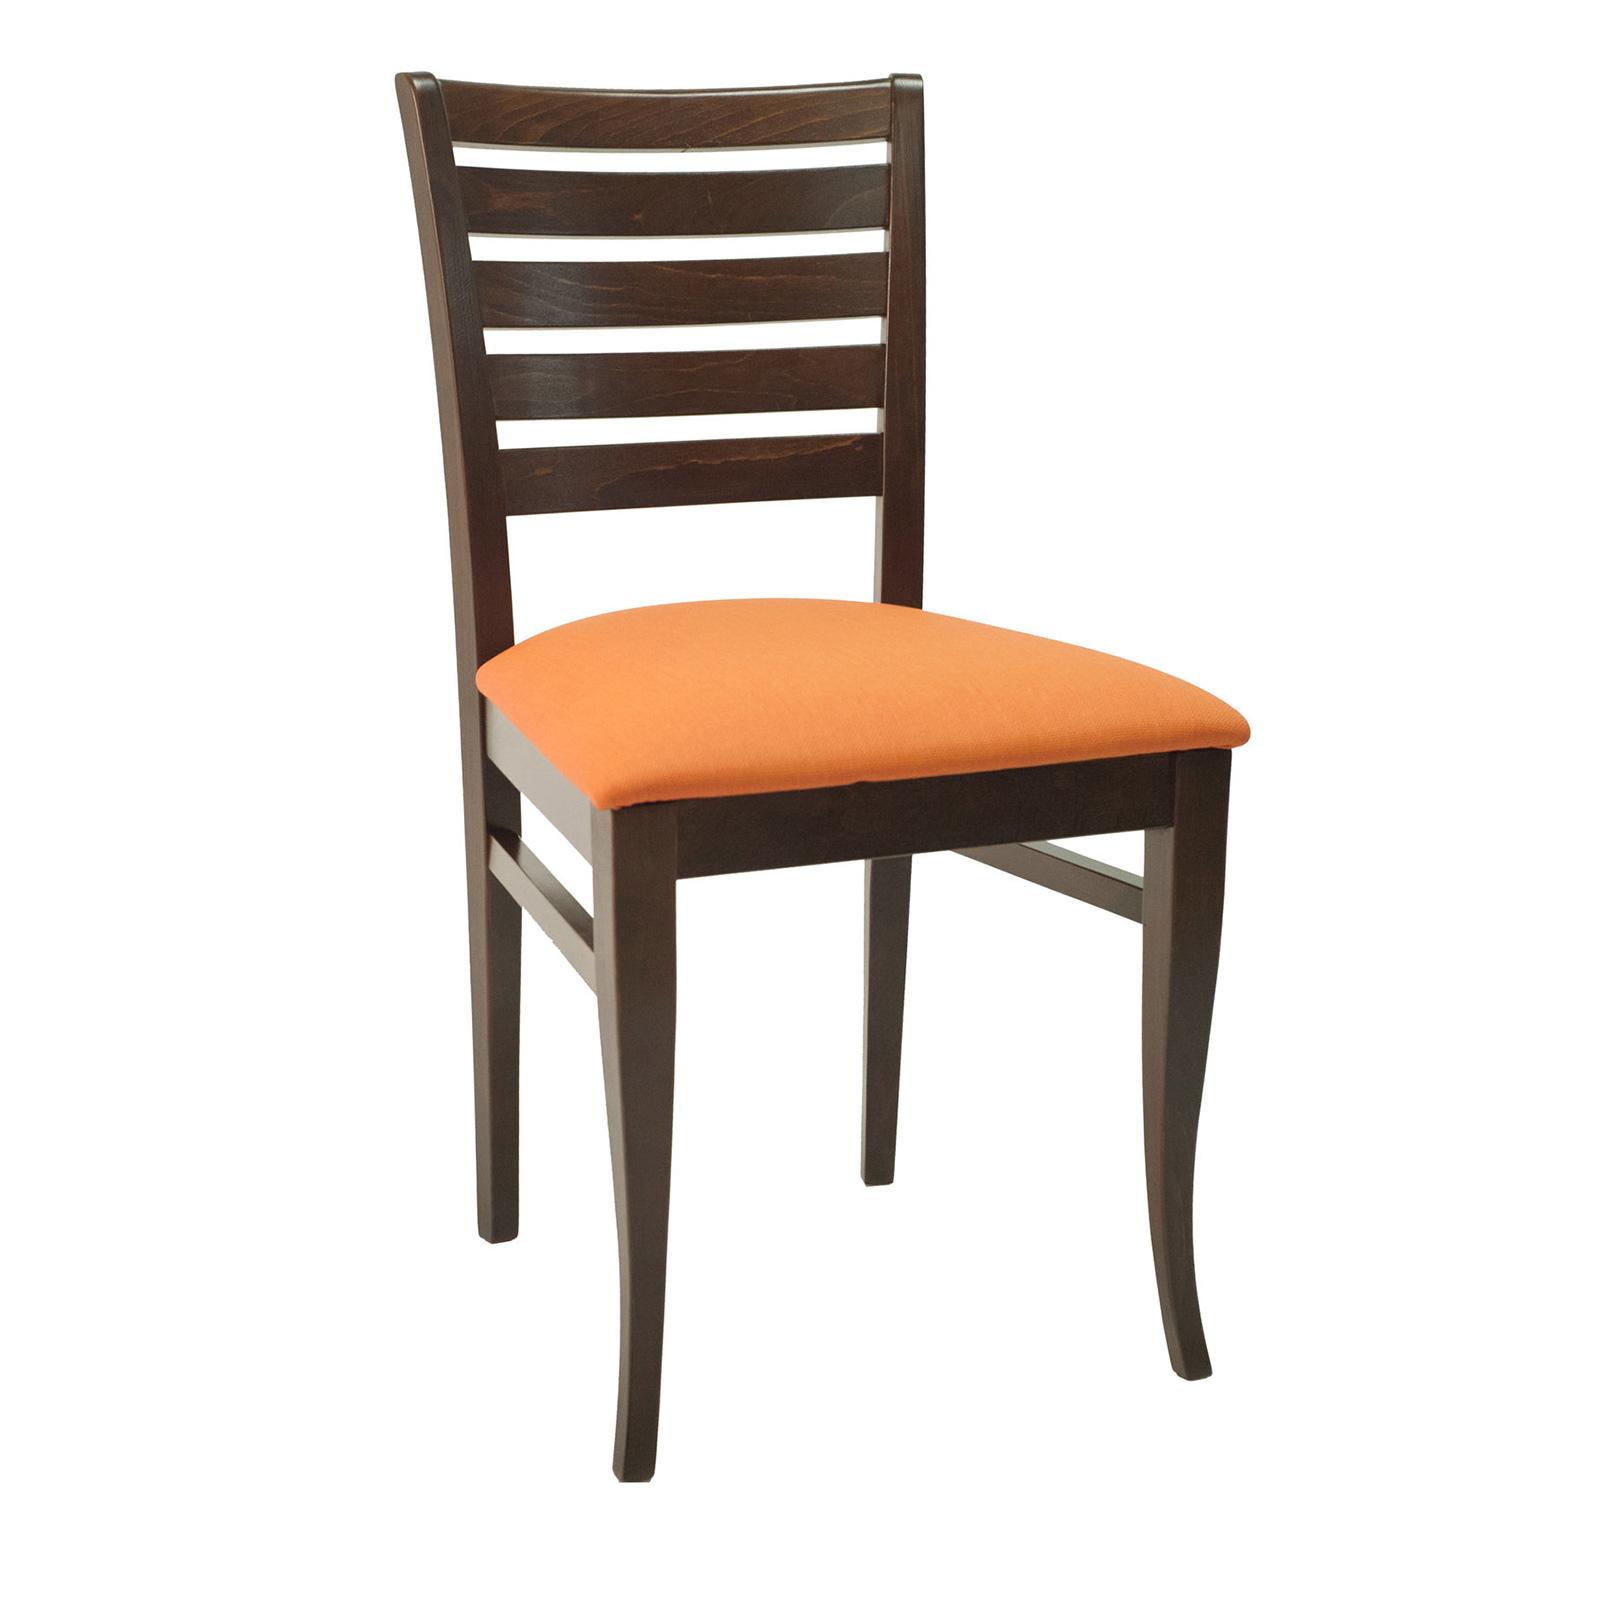 Florida Seating FLS-13S GR5 chair, side, indoor